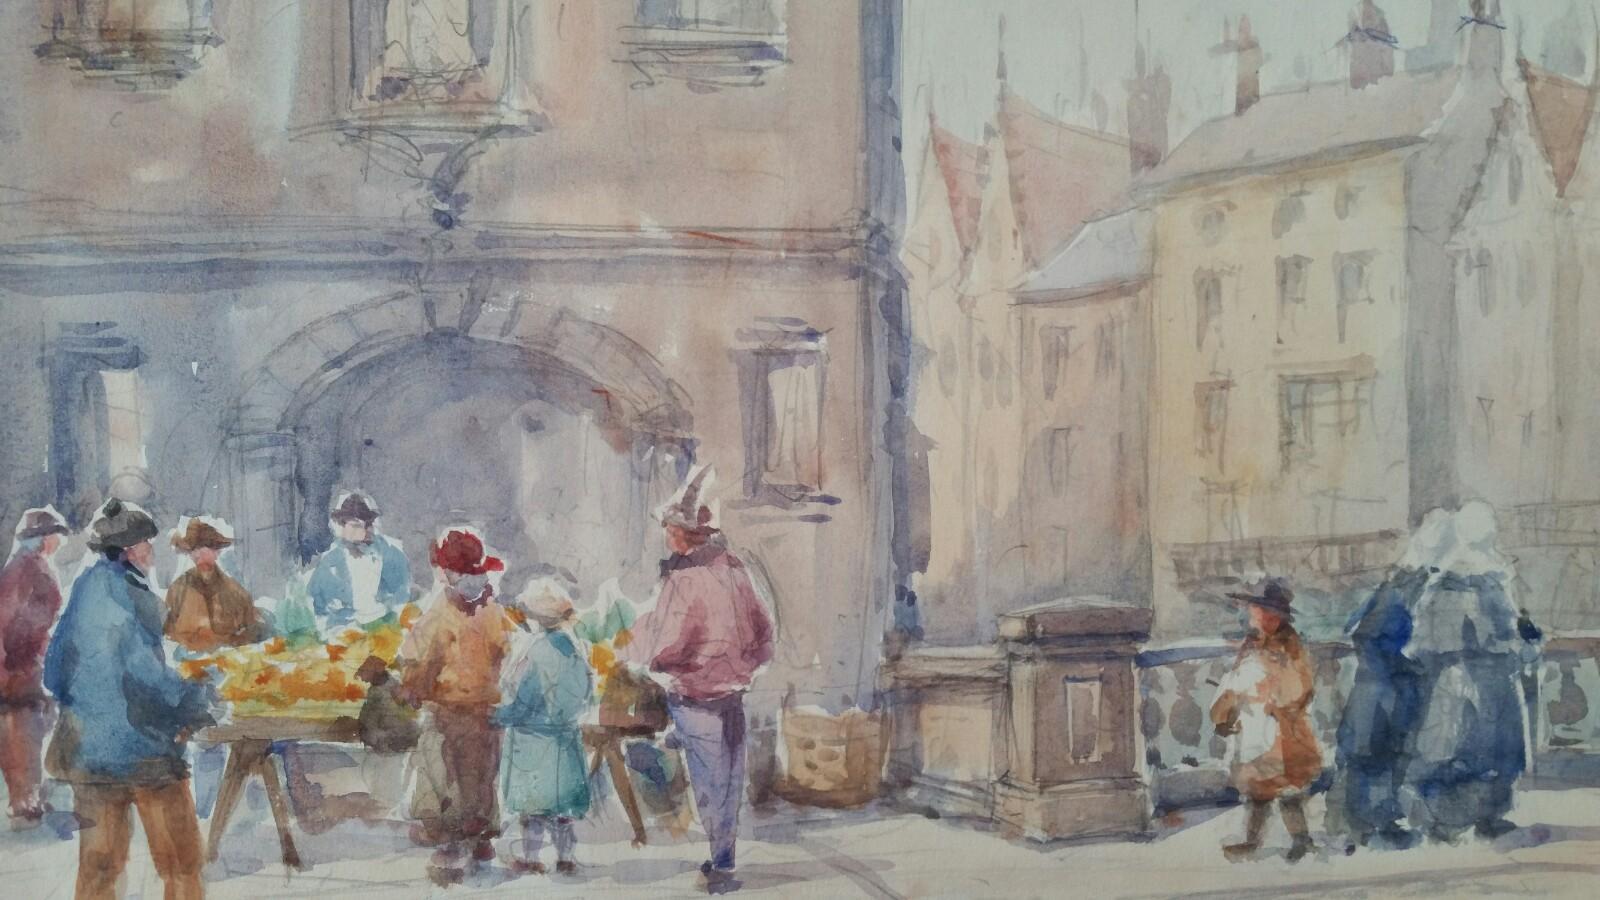 Mid 20th Century, Belgium, A Gent Morning Market